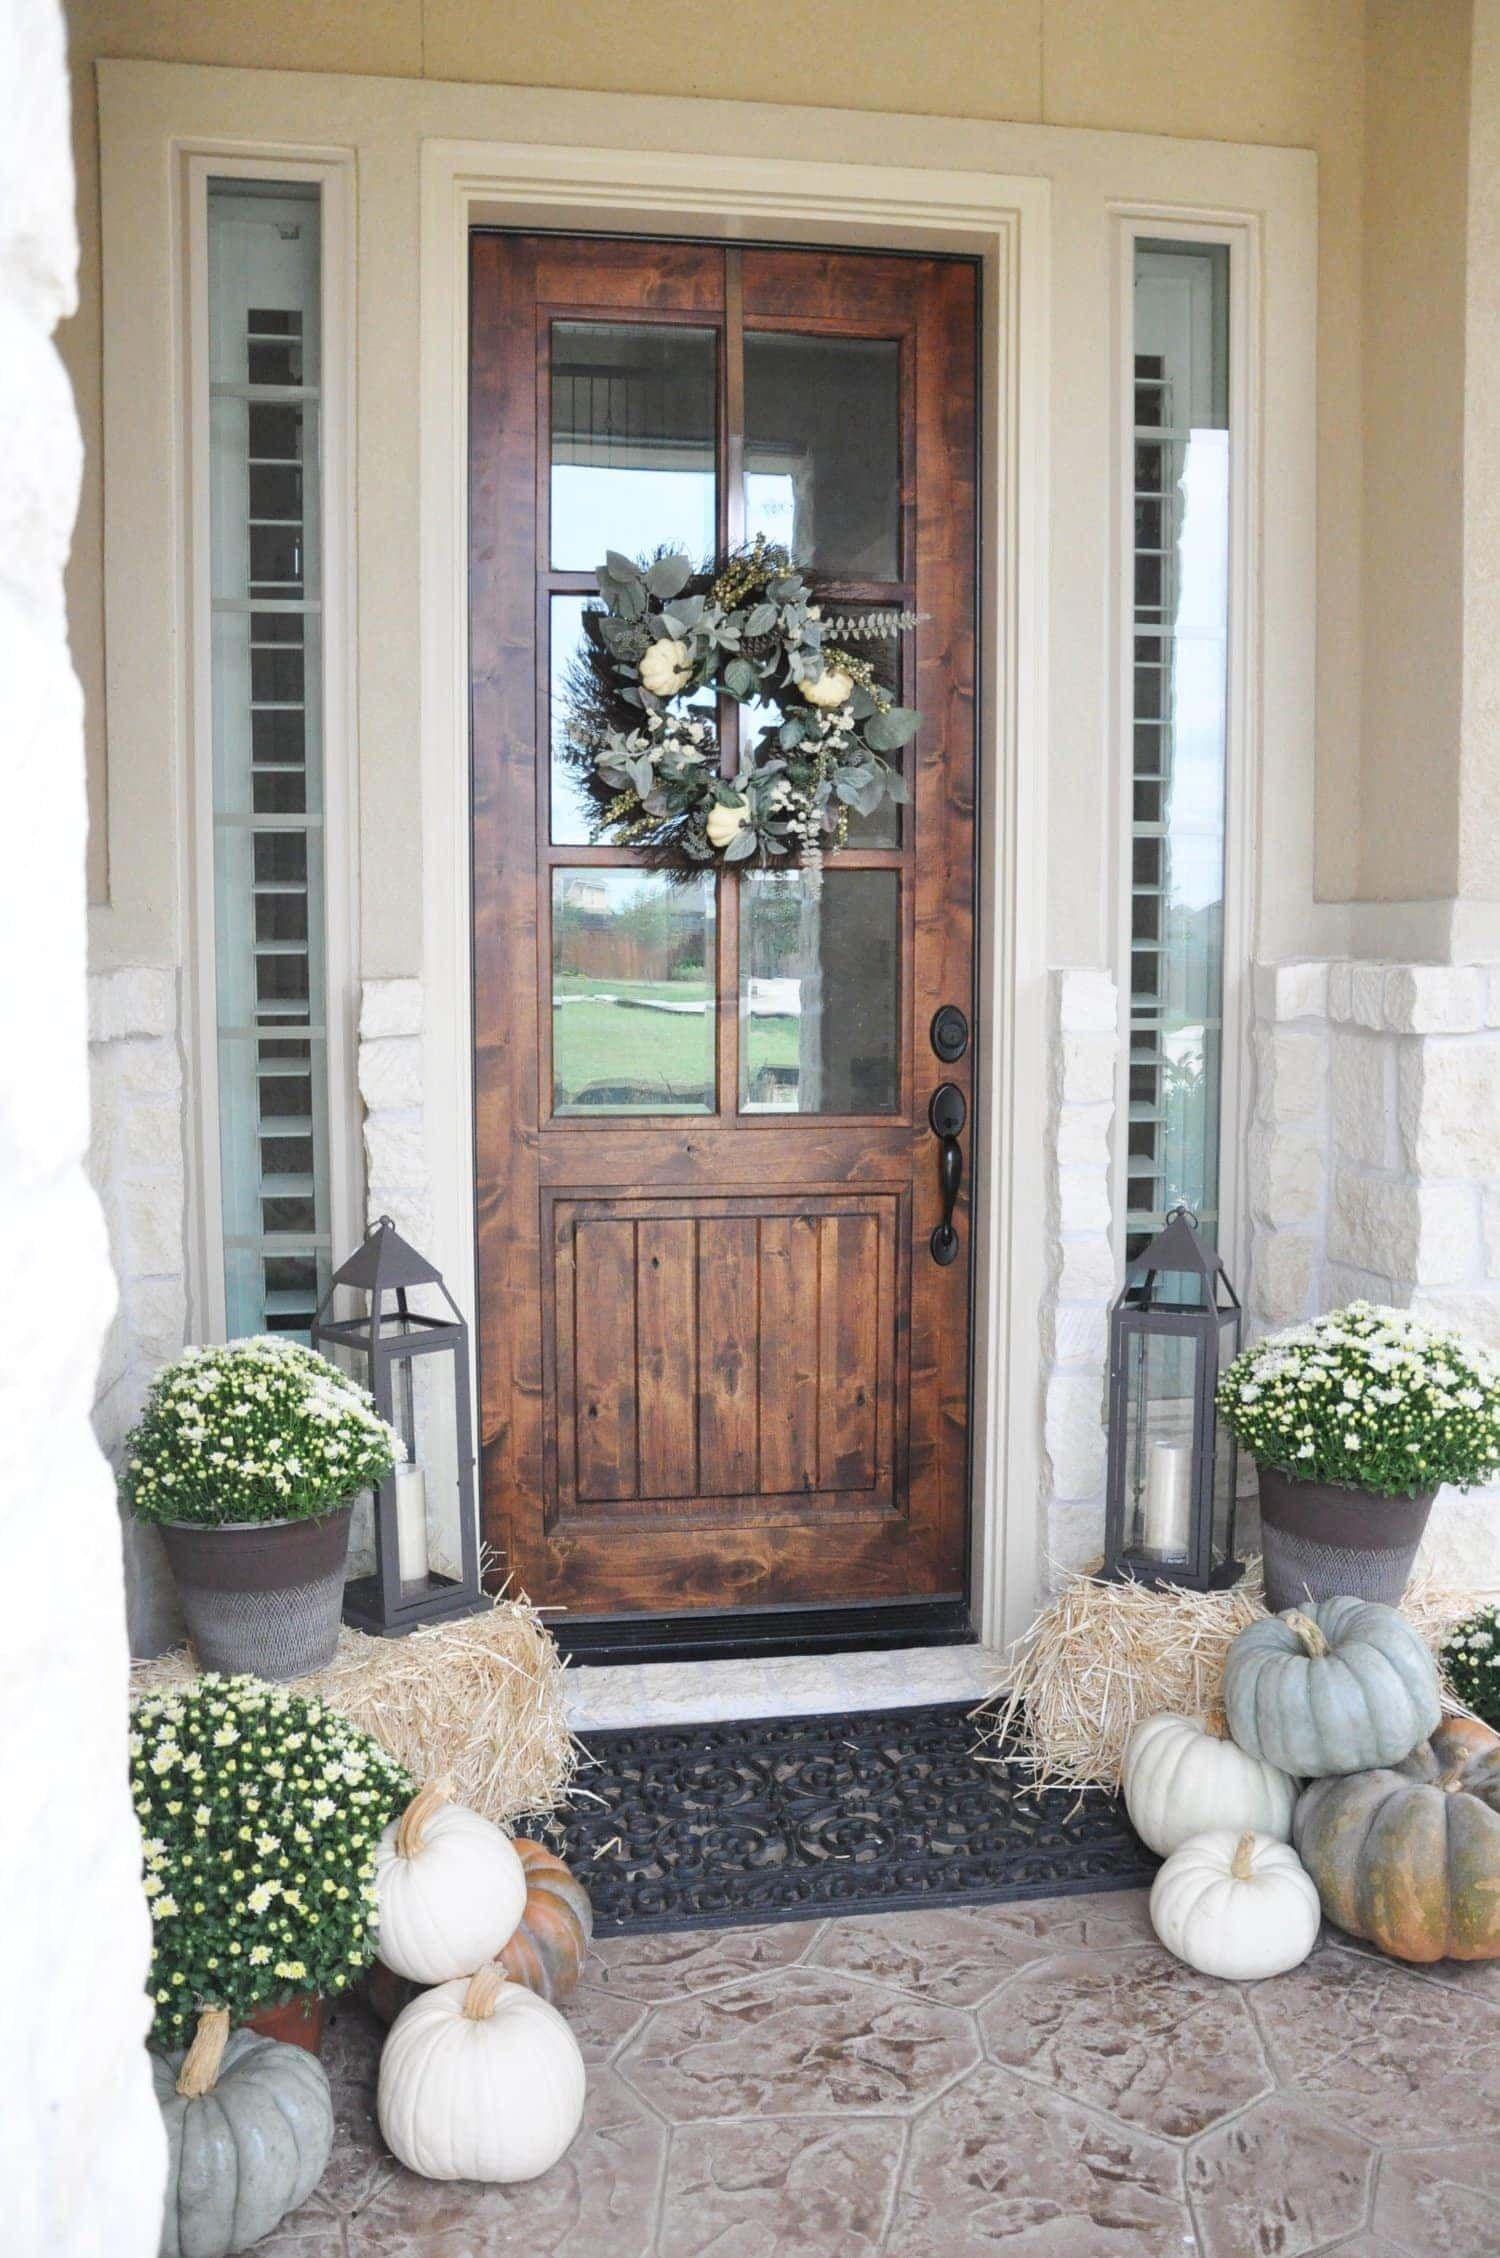 15 Fall Front Porch Decorating Ideas Make Your Porch Look Amazing Autumn Home Farmhouse Fall Decor Fall Home Decor